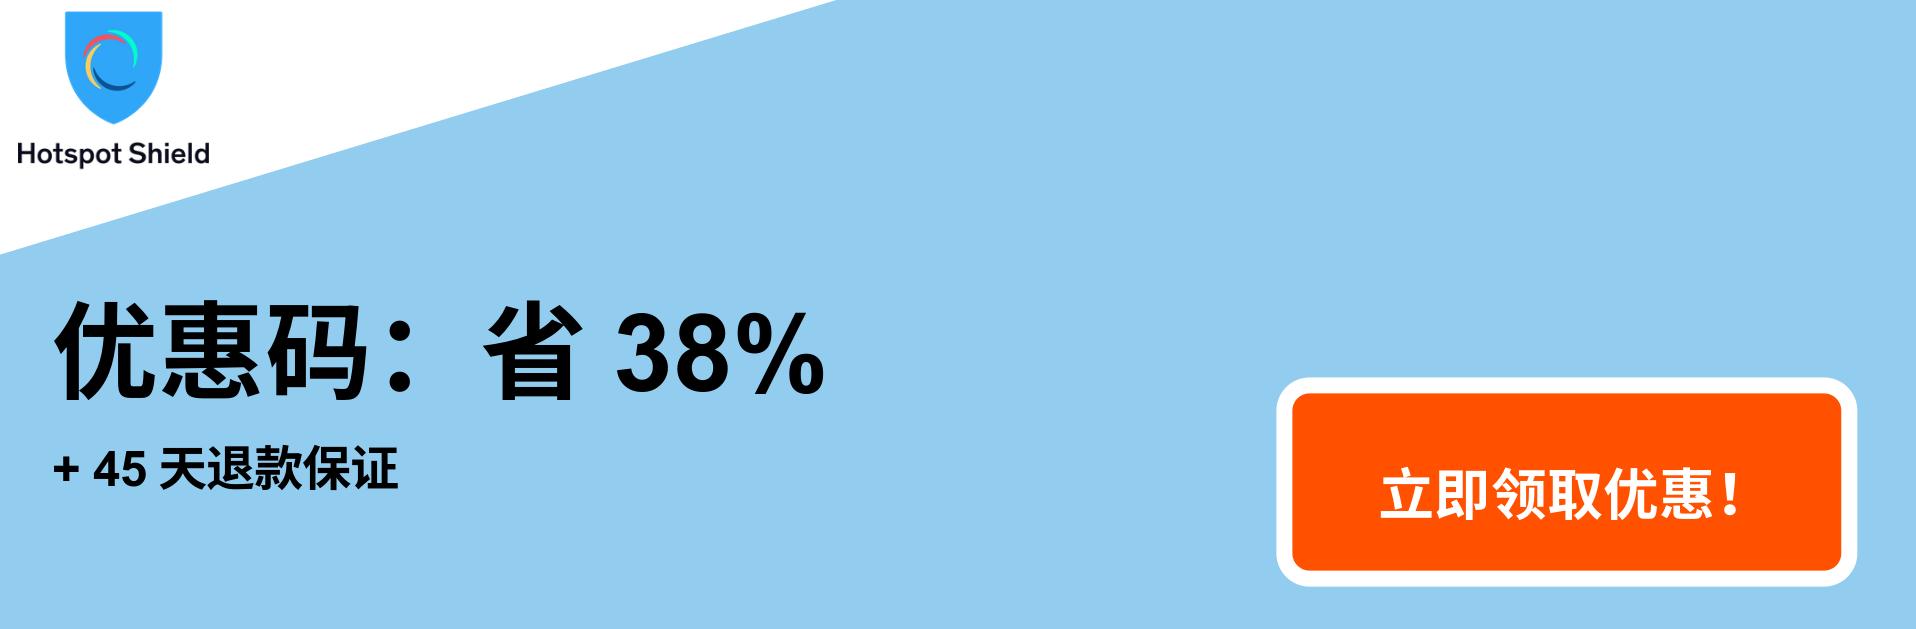 hotspotshield vpn coupon banner 38% off